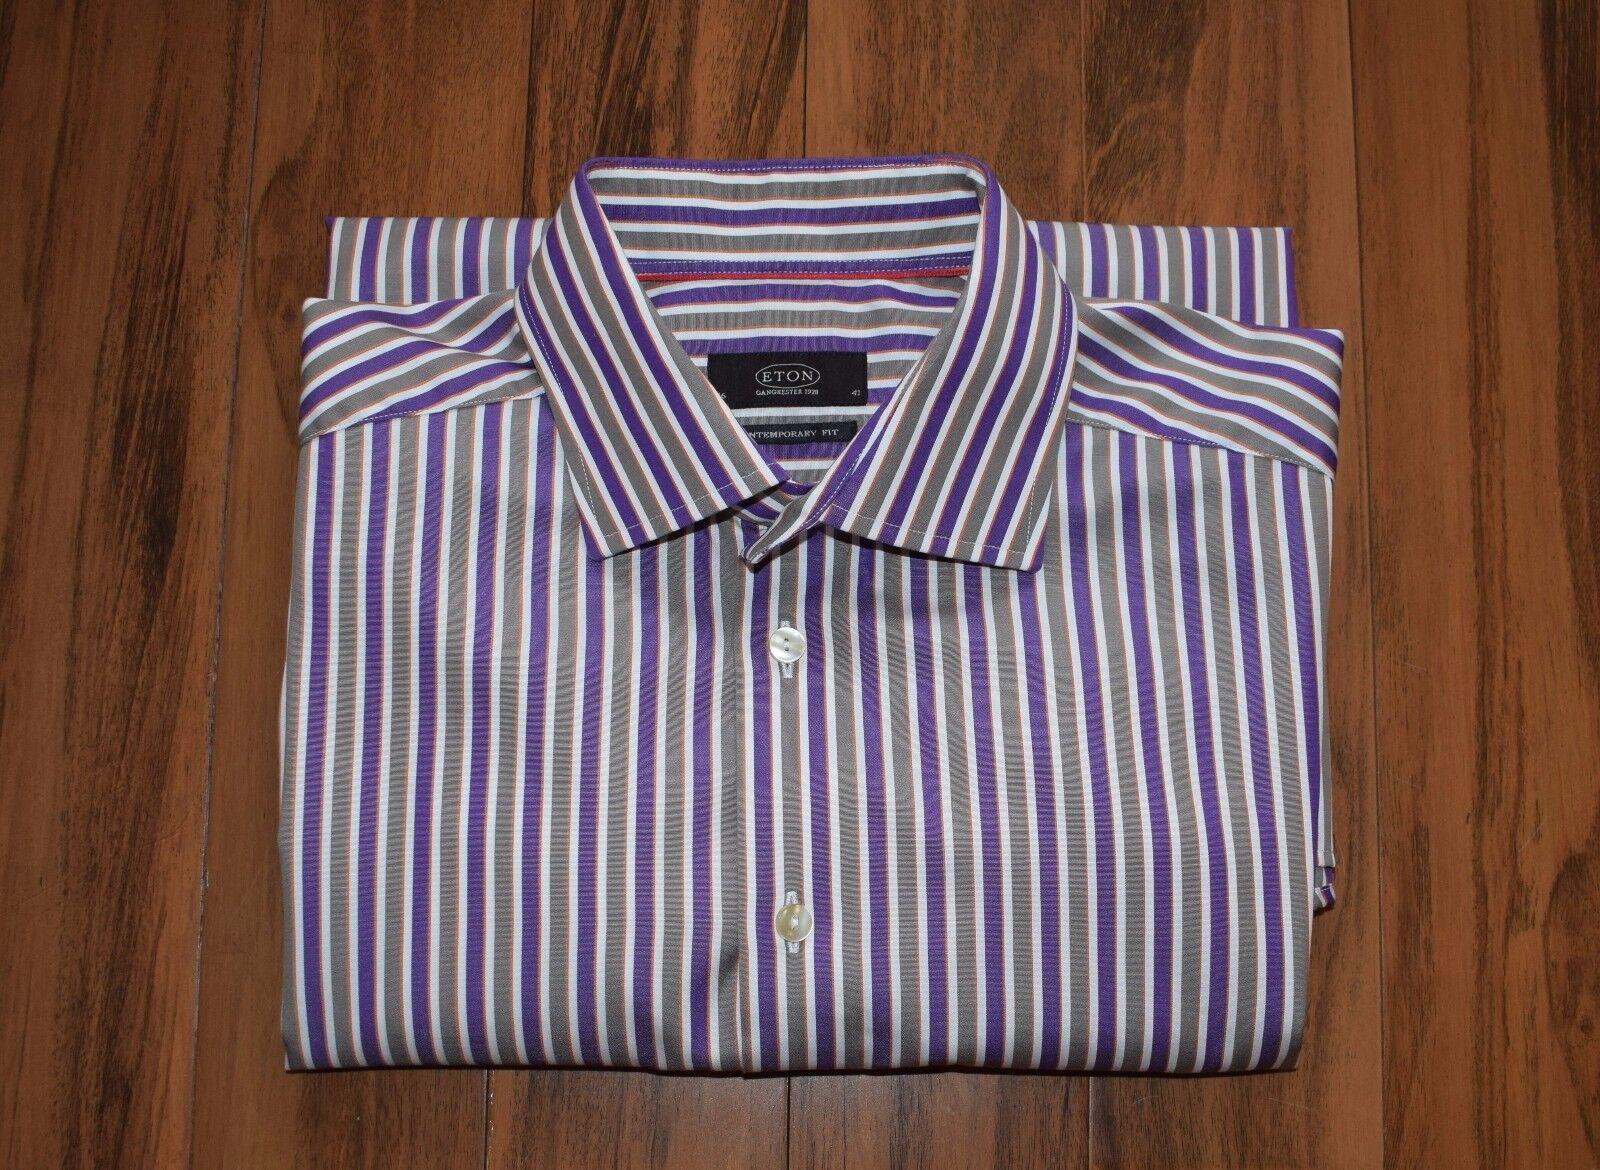 73523a6df67808 Stunning ETON Men s Shirt Size for SALE 41 16 nrrtuq14338-Formal ...